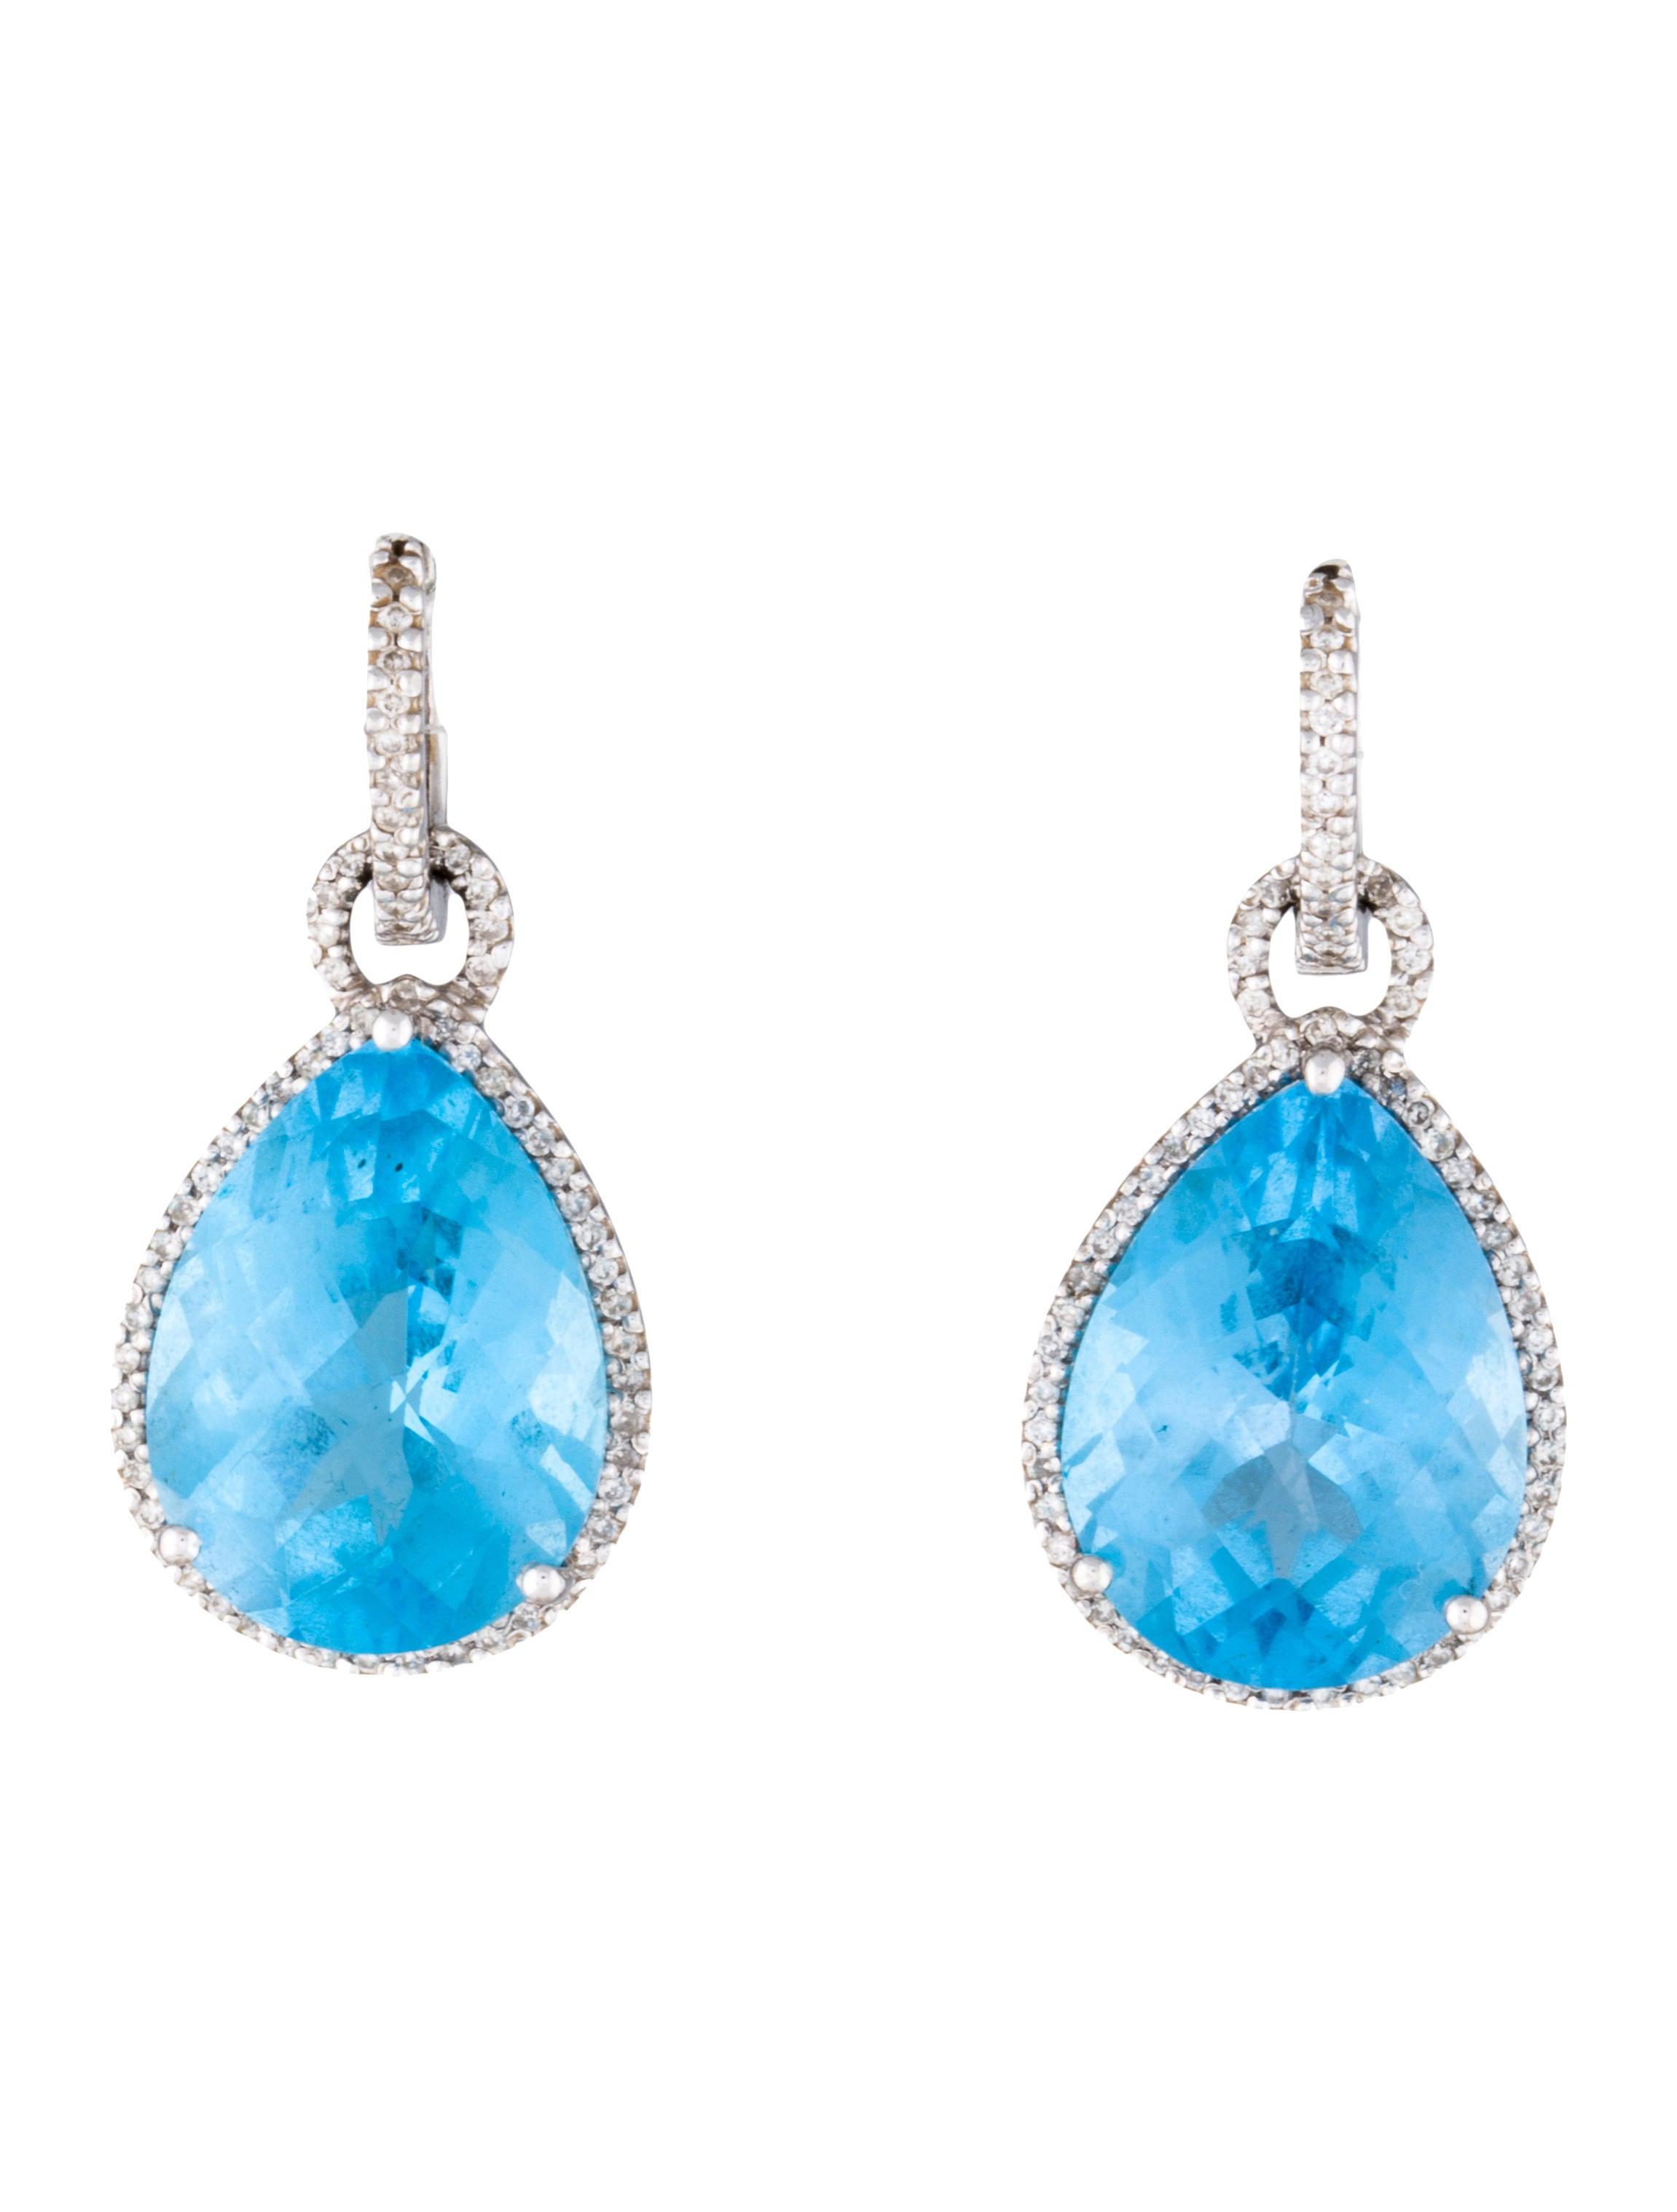 diamond halo blue topaz earrings earrings fje24530. Black Bedroom Furniture Sets. Home Design Ideas